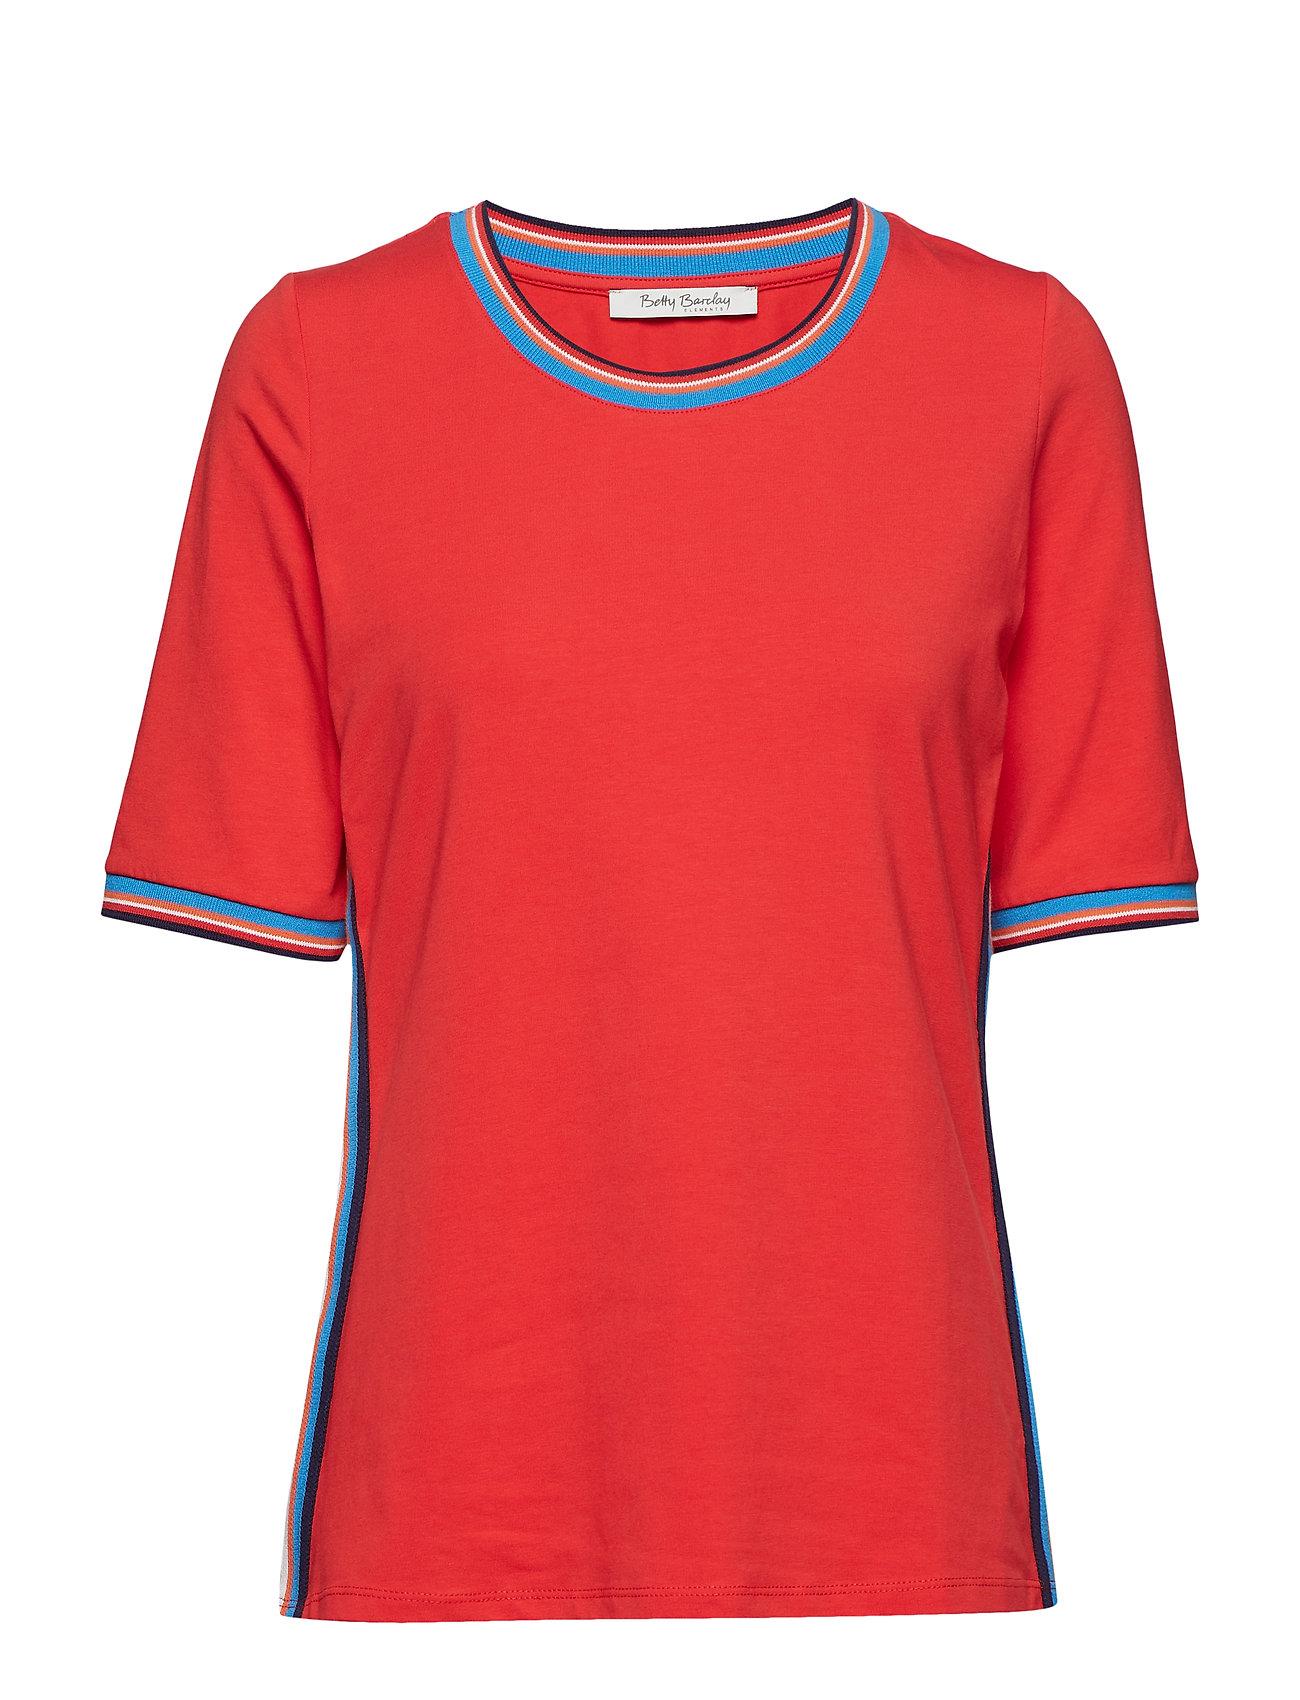 Shirt 2 Short 1 Barclay RedBetty Sleevehibiscus hdtsQr